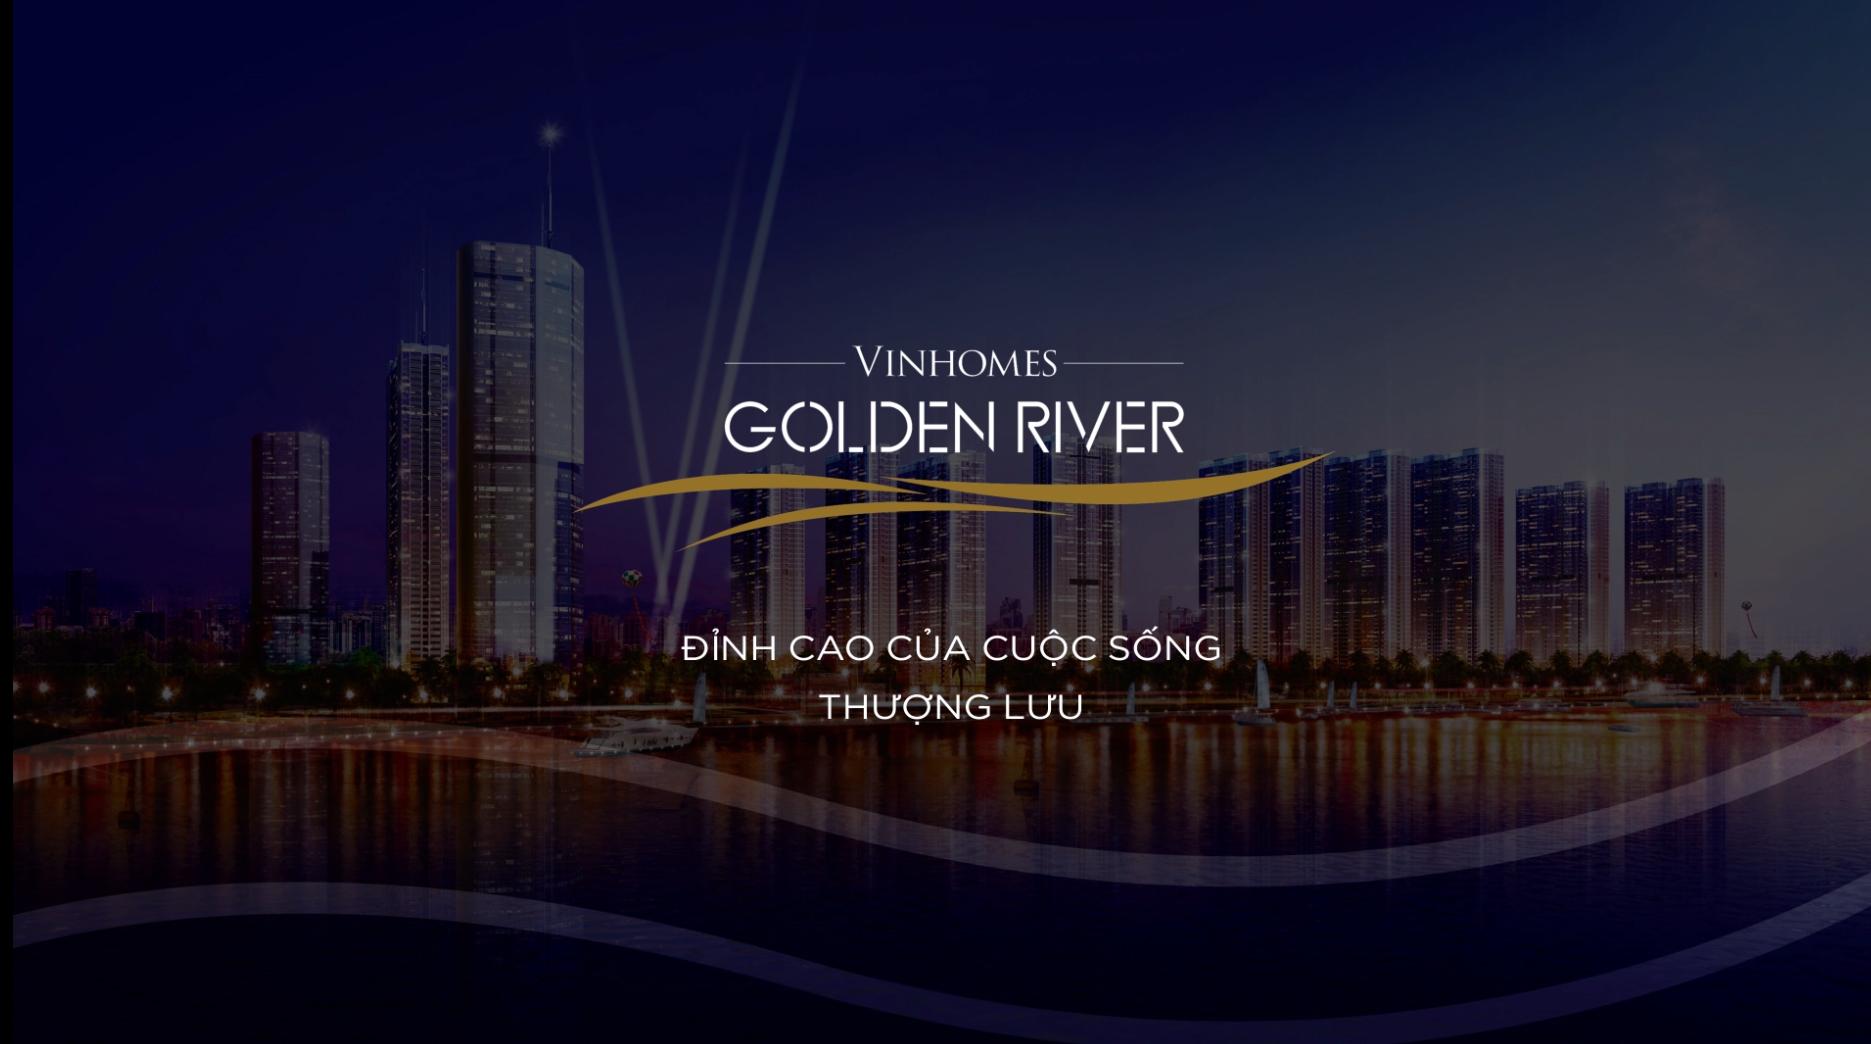 VinHomes Golden River TVC